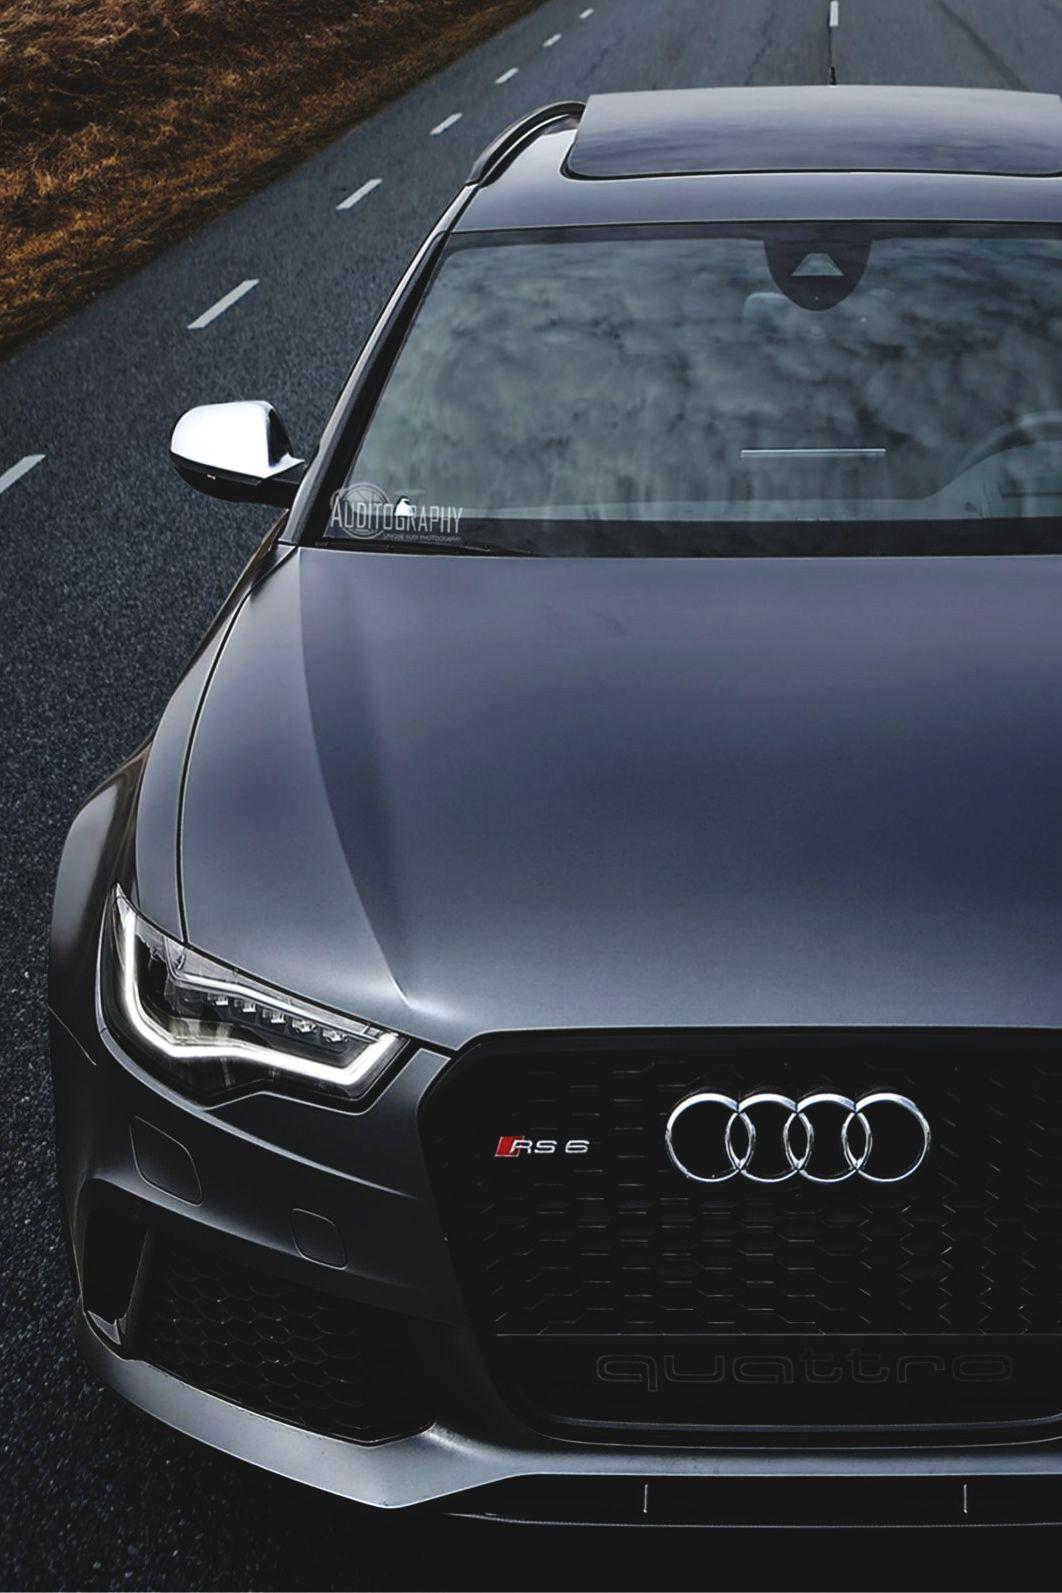 Black Matt Audi Rs 6 Audi Rs6 Audi Sportwagen Und Audi